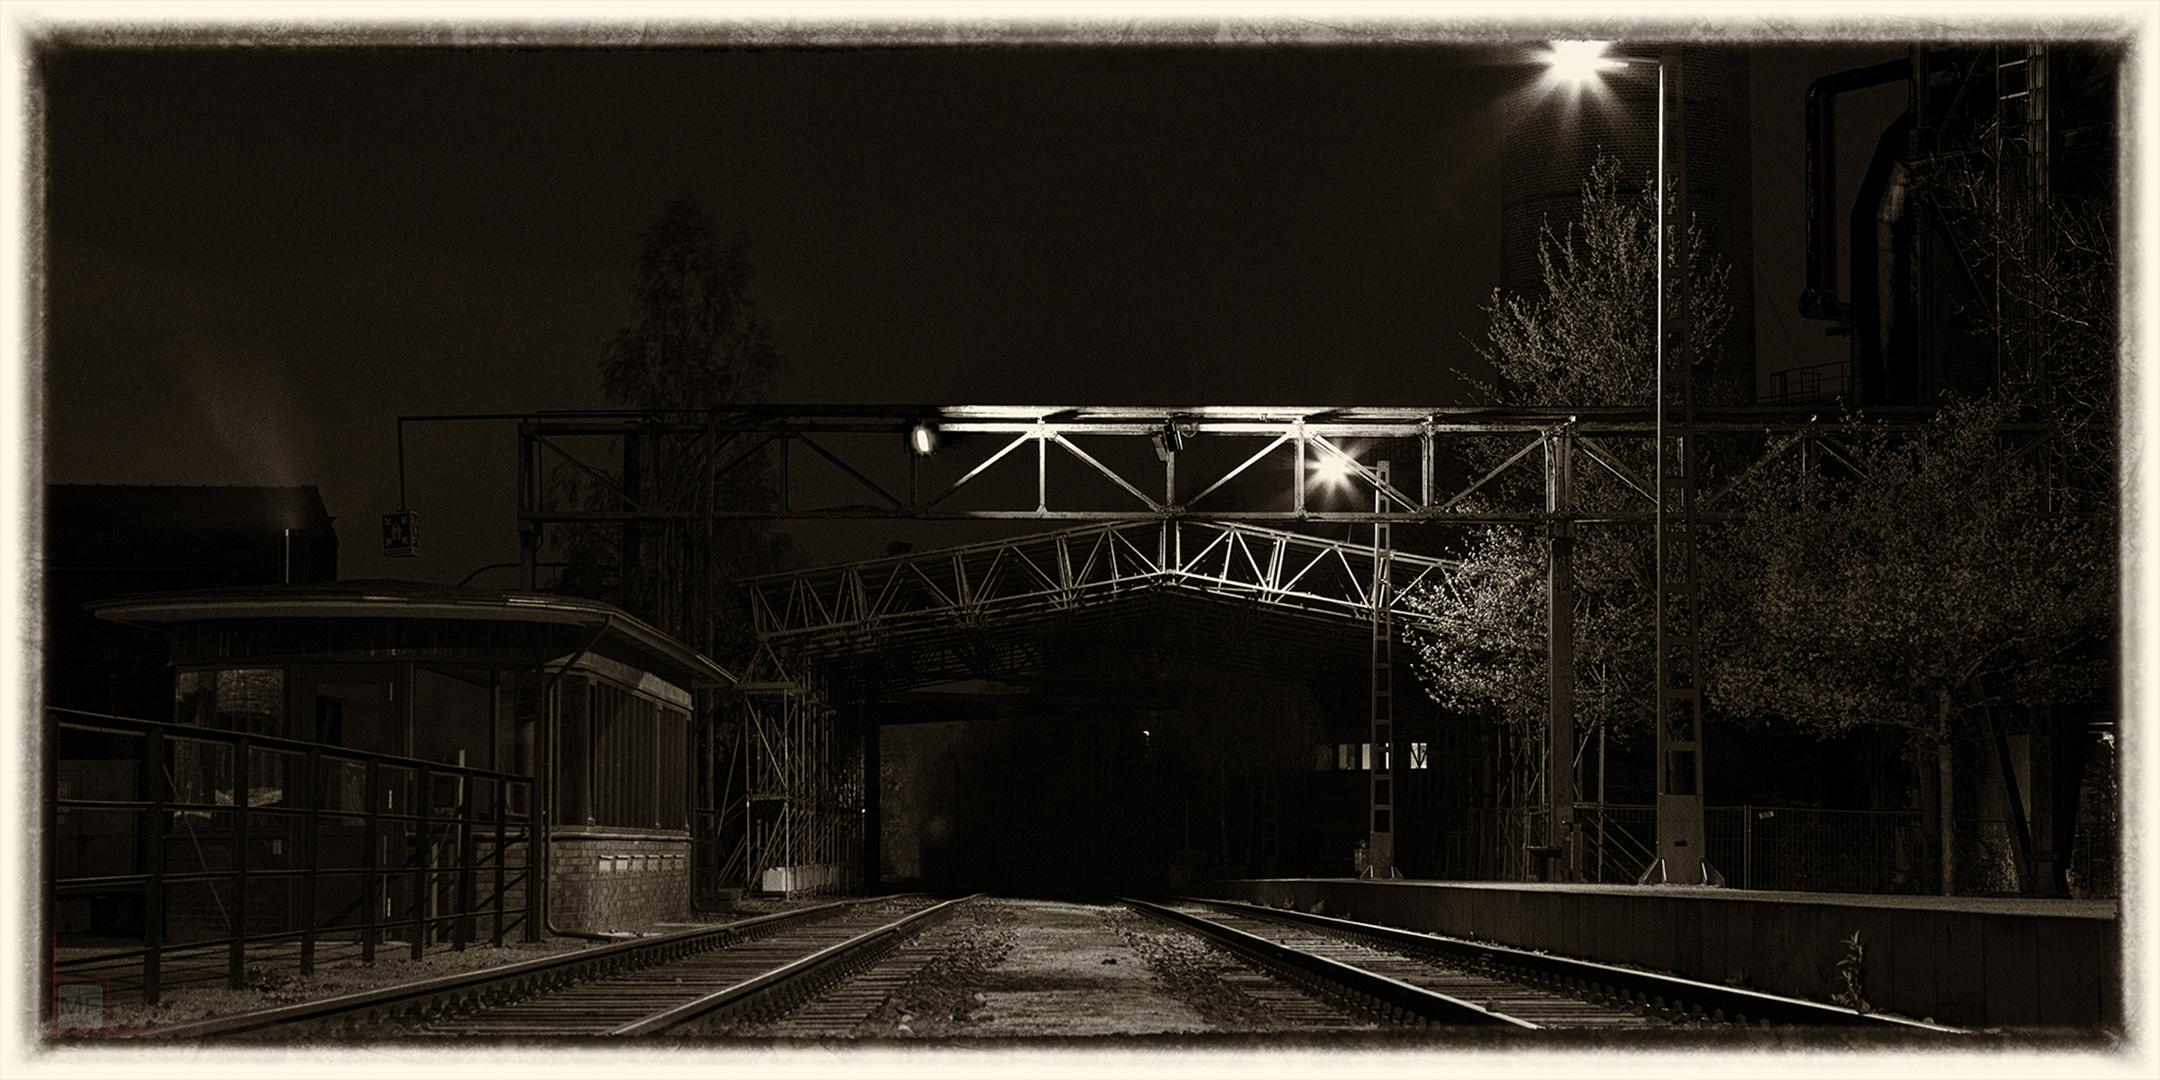 forgotten worlds | The fast train in the dark...